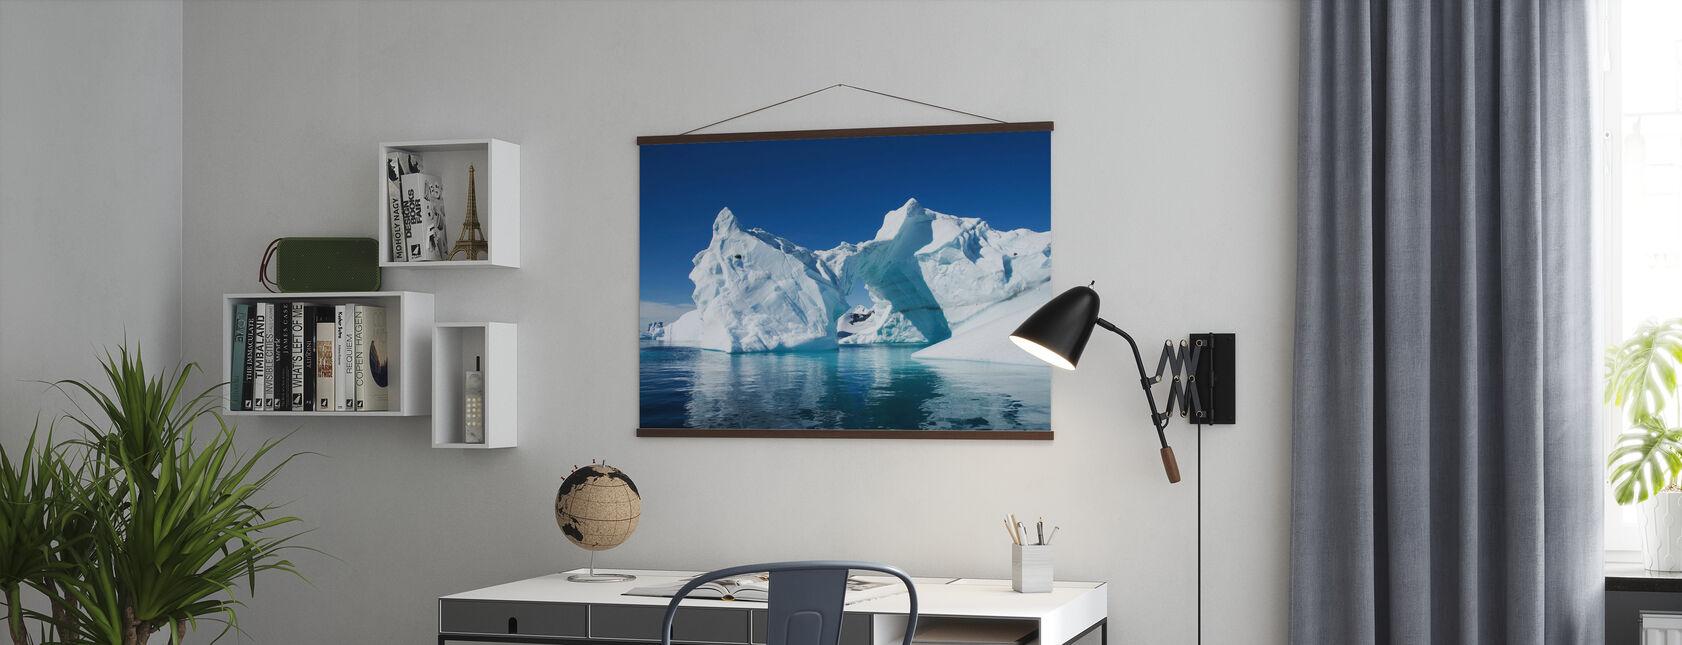 Isbjerg Antarktis - Plakat - Kontor